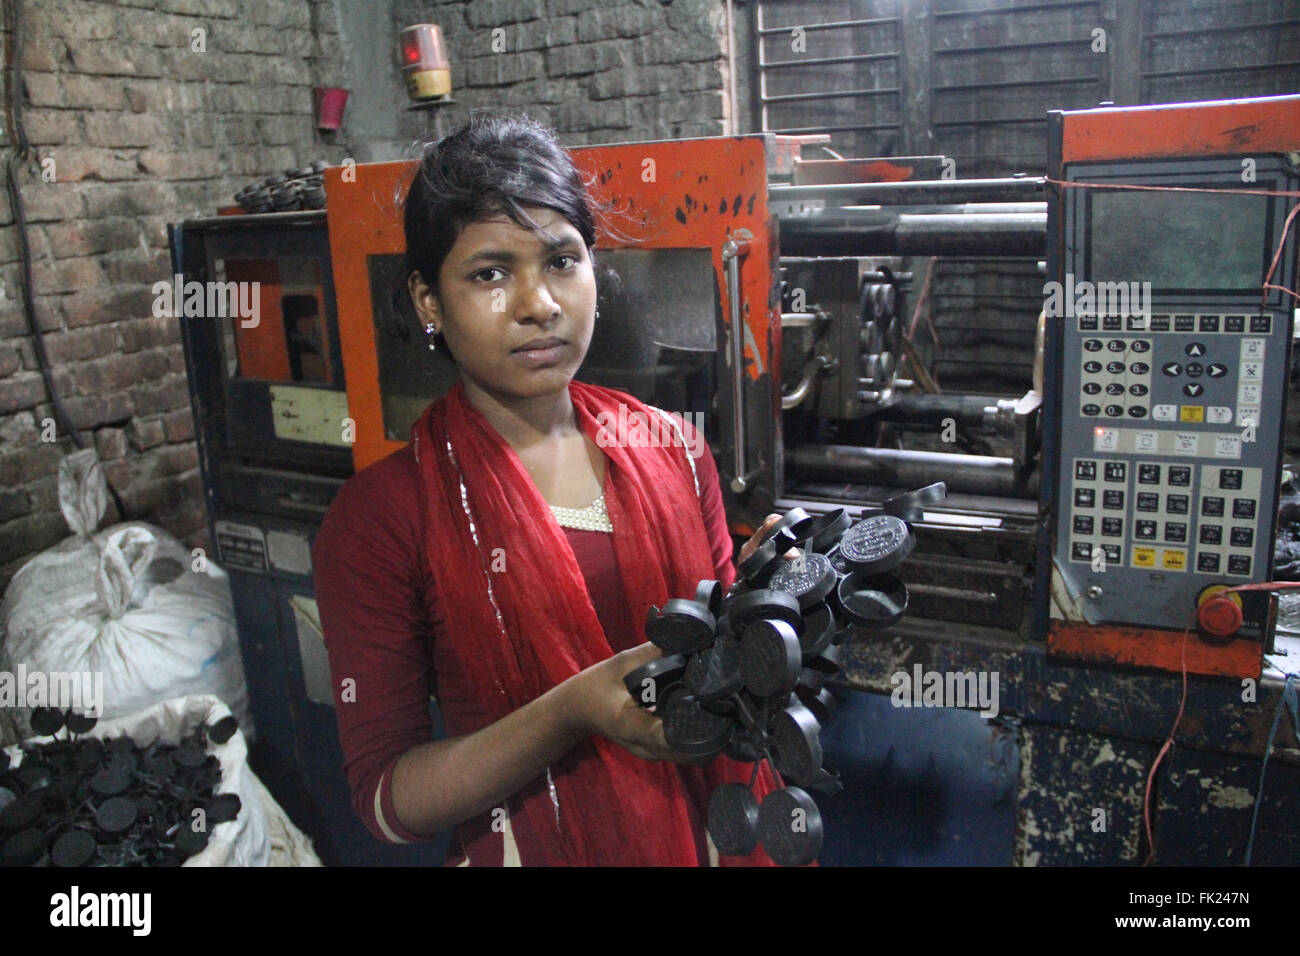 Dhaka, Bangladesh. 5 March 2016. A Bangladeshi girl is working at a plastic re-cycle factory at Lalbag in Dhaka, - Stock Image